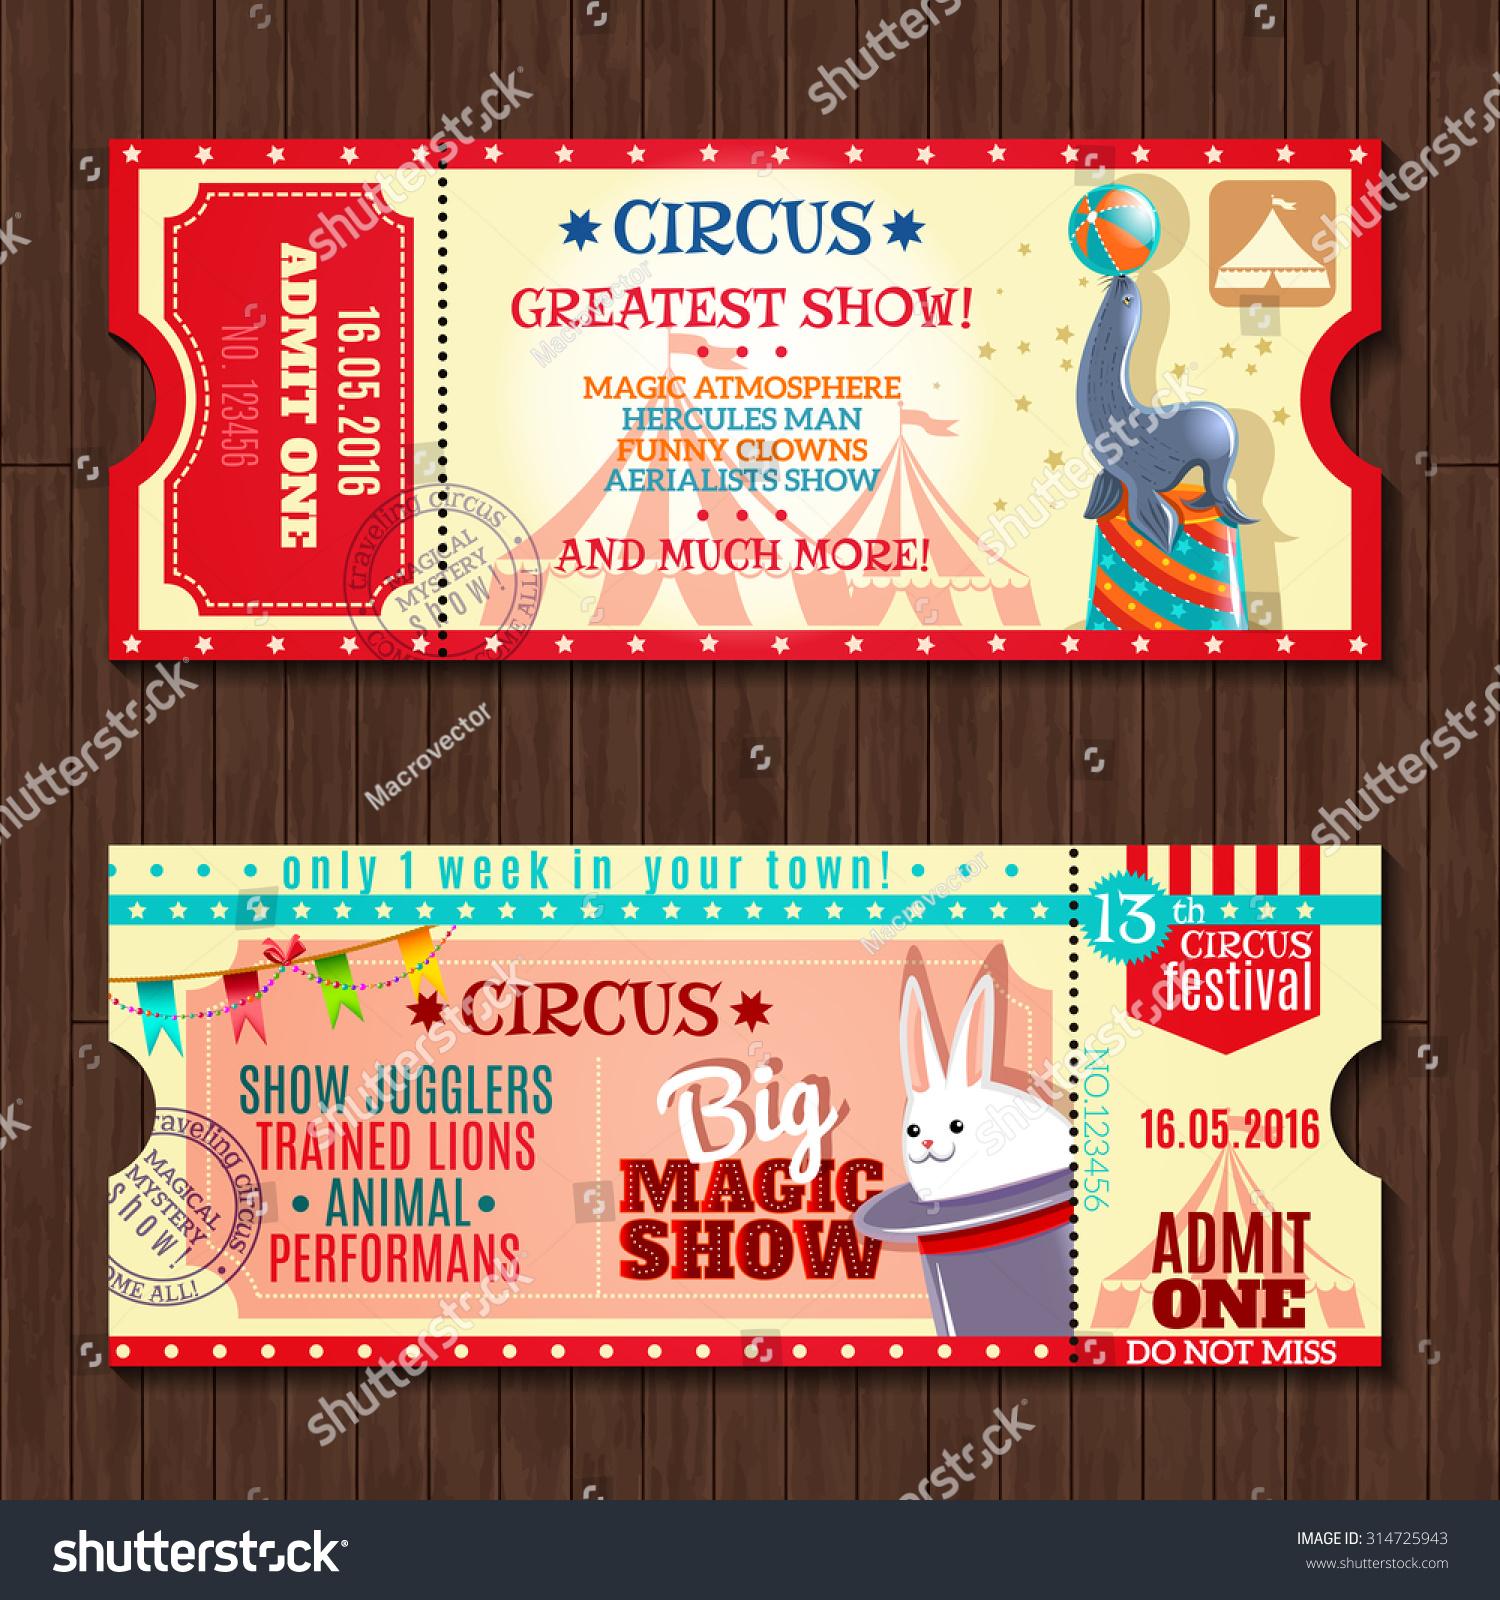 Doc600253 Show Ticket Template Night Club ticket template – Show Ticket Template